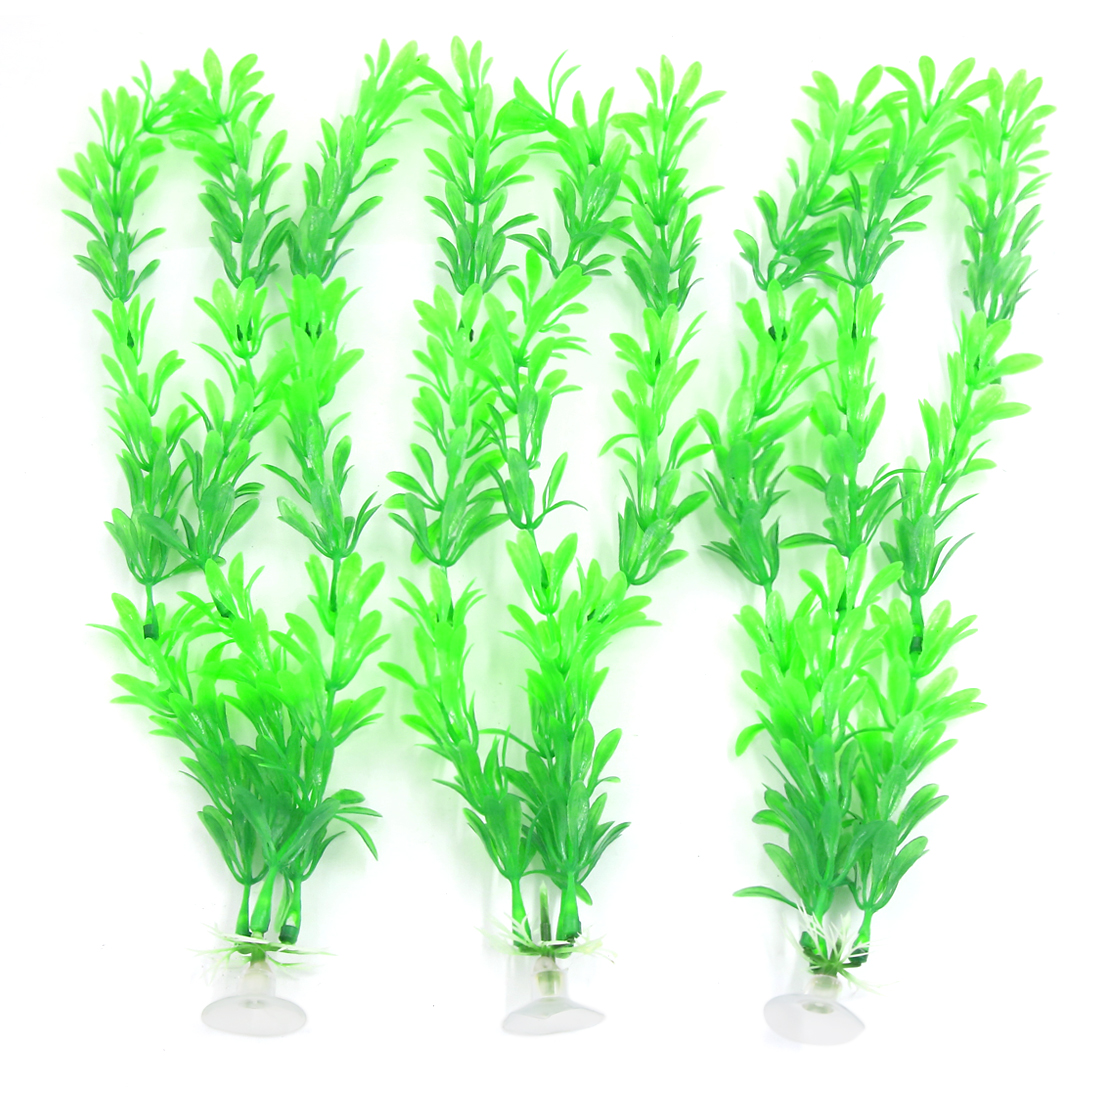 3 PCS 30cm High Green Aqua Landscape Aquarium Plastic Plant with Suction Cup